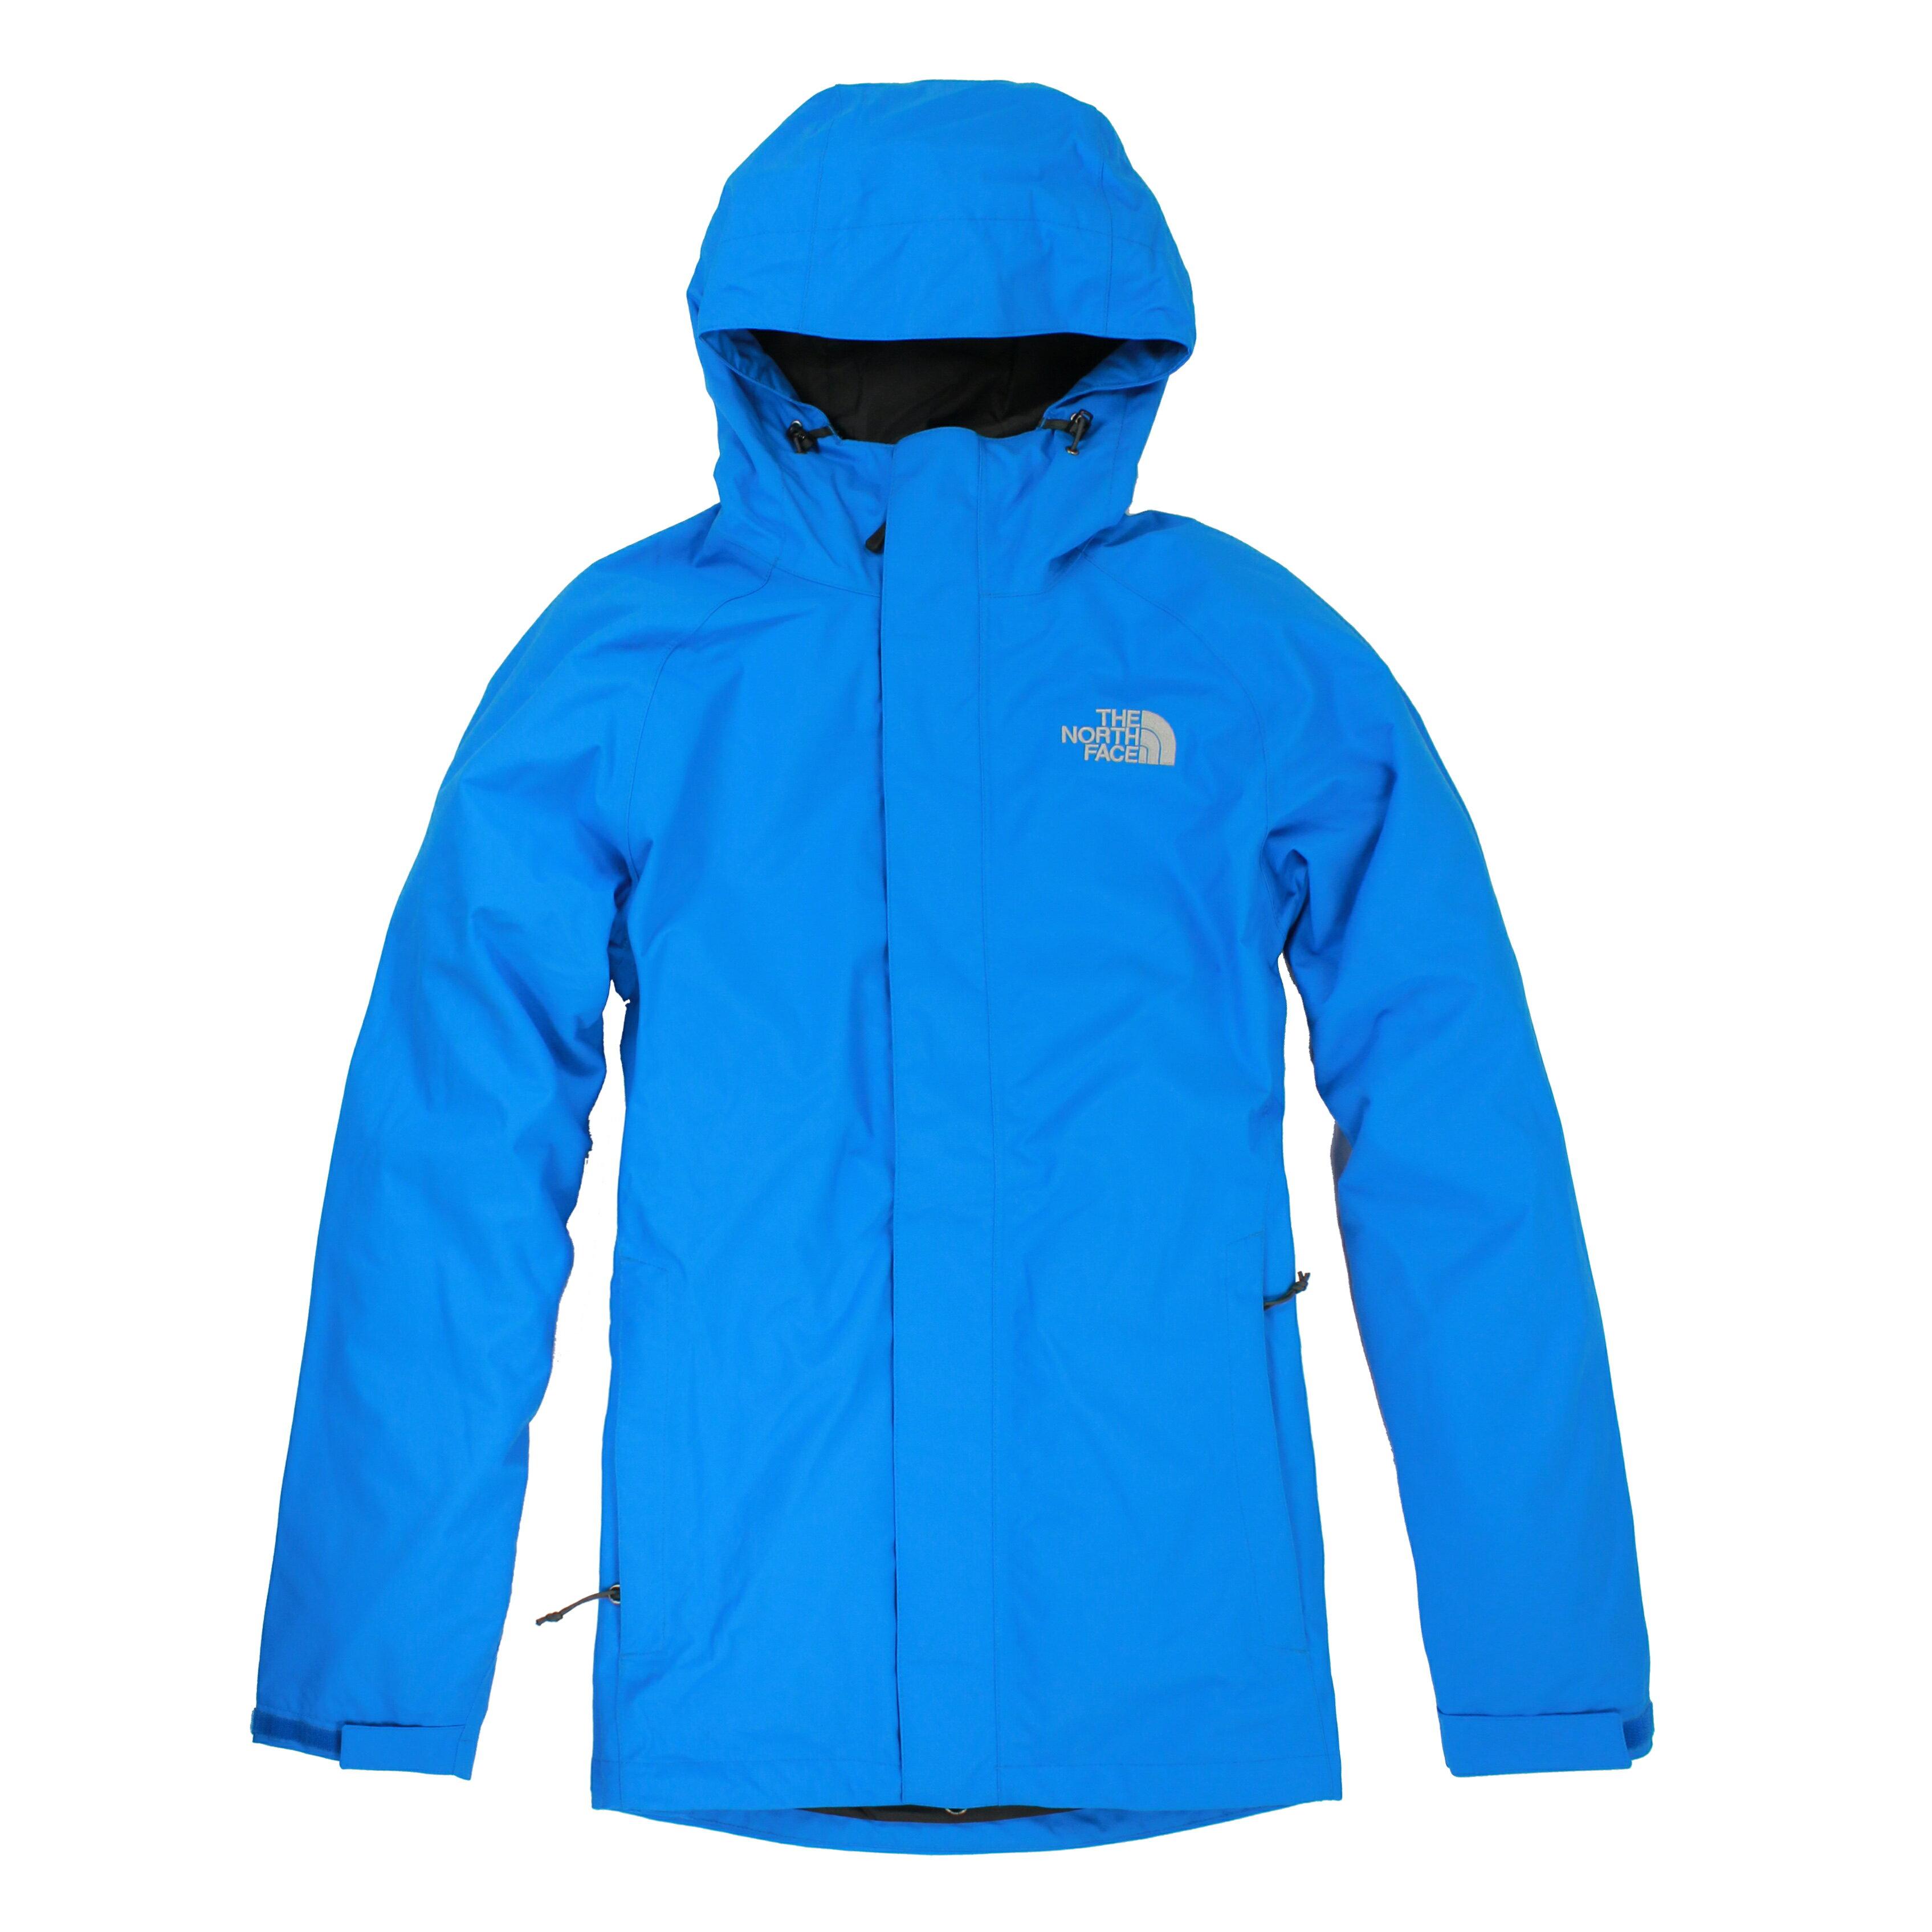 美國百分百【The North Face 】外套 TNF 夾克 連帽 防水 防風 北臉 Hyvent S 藍 E286